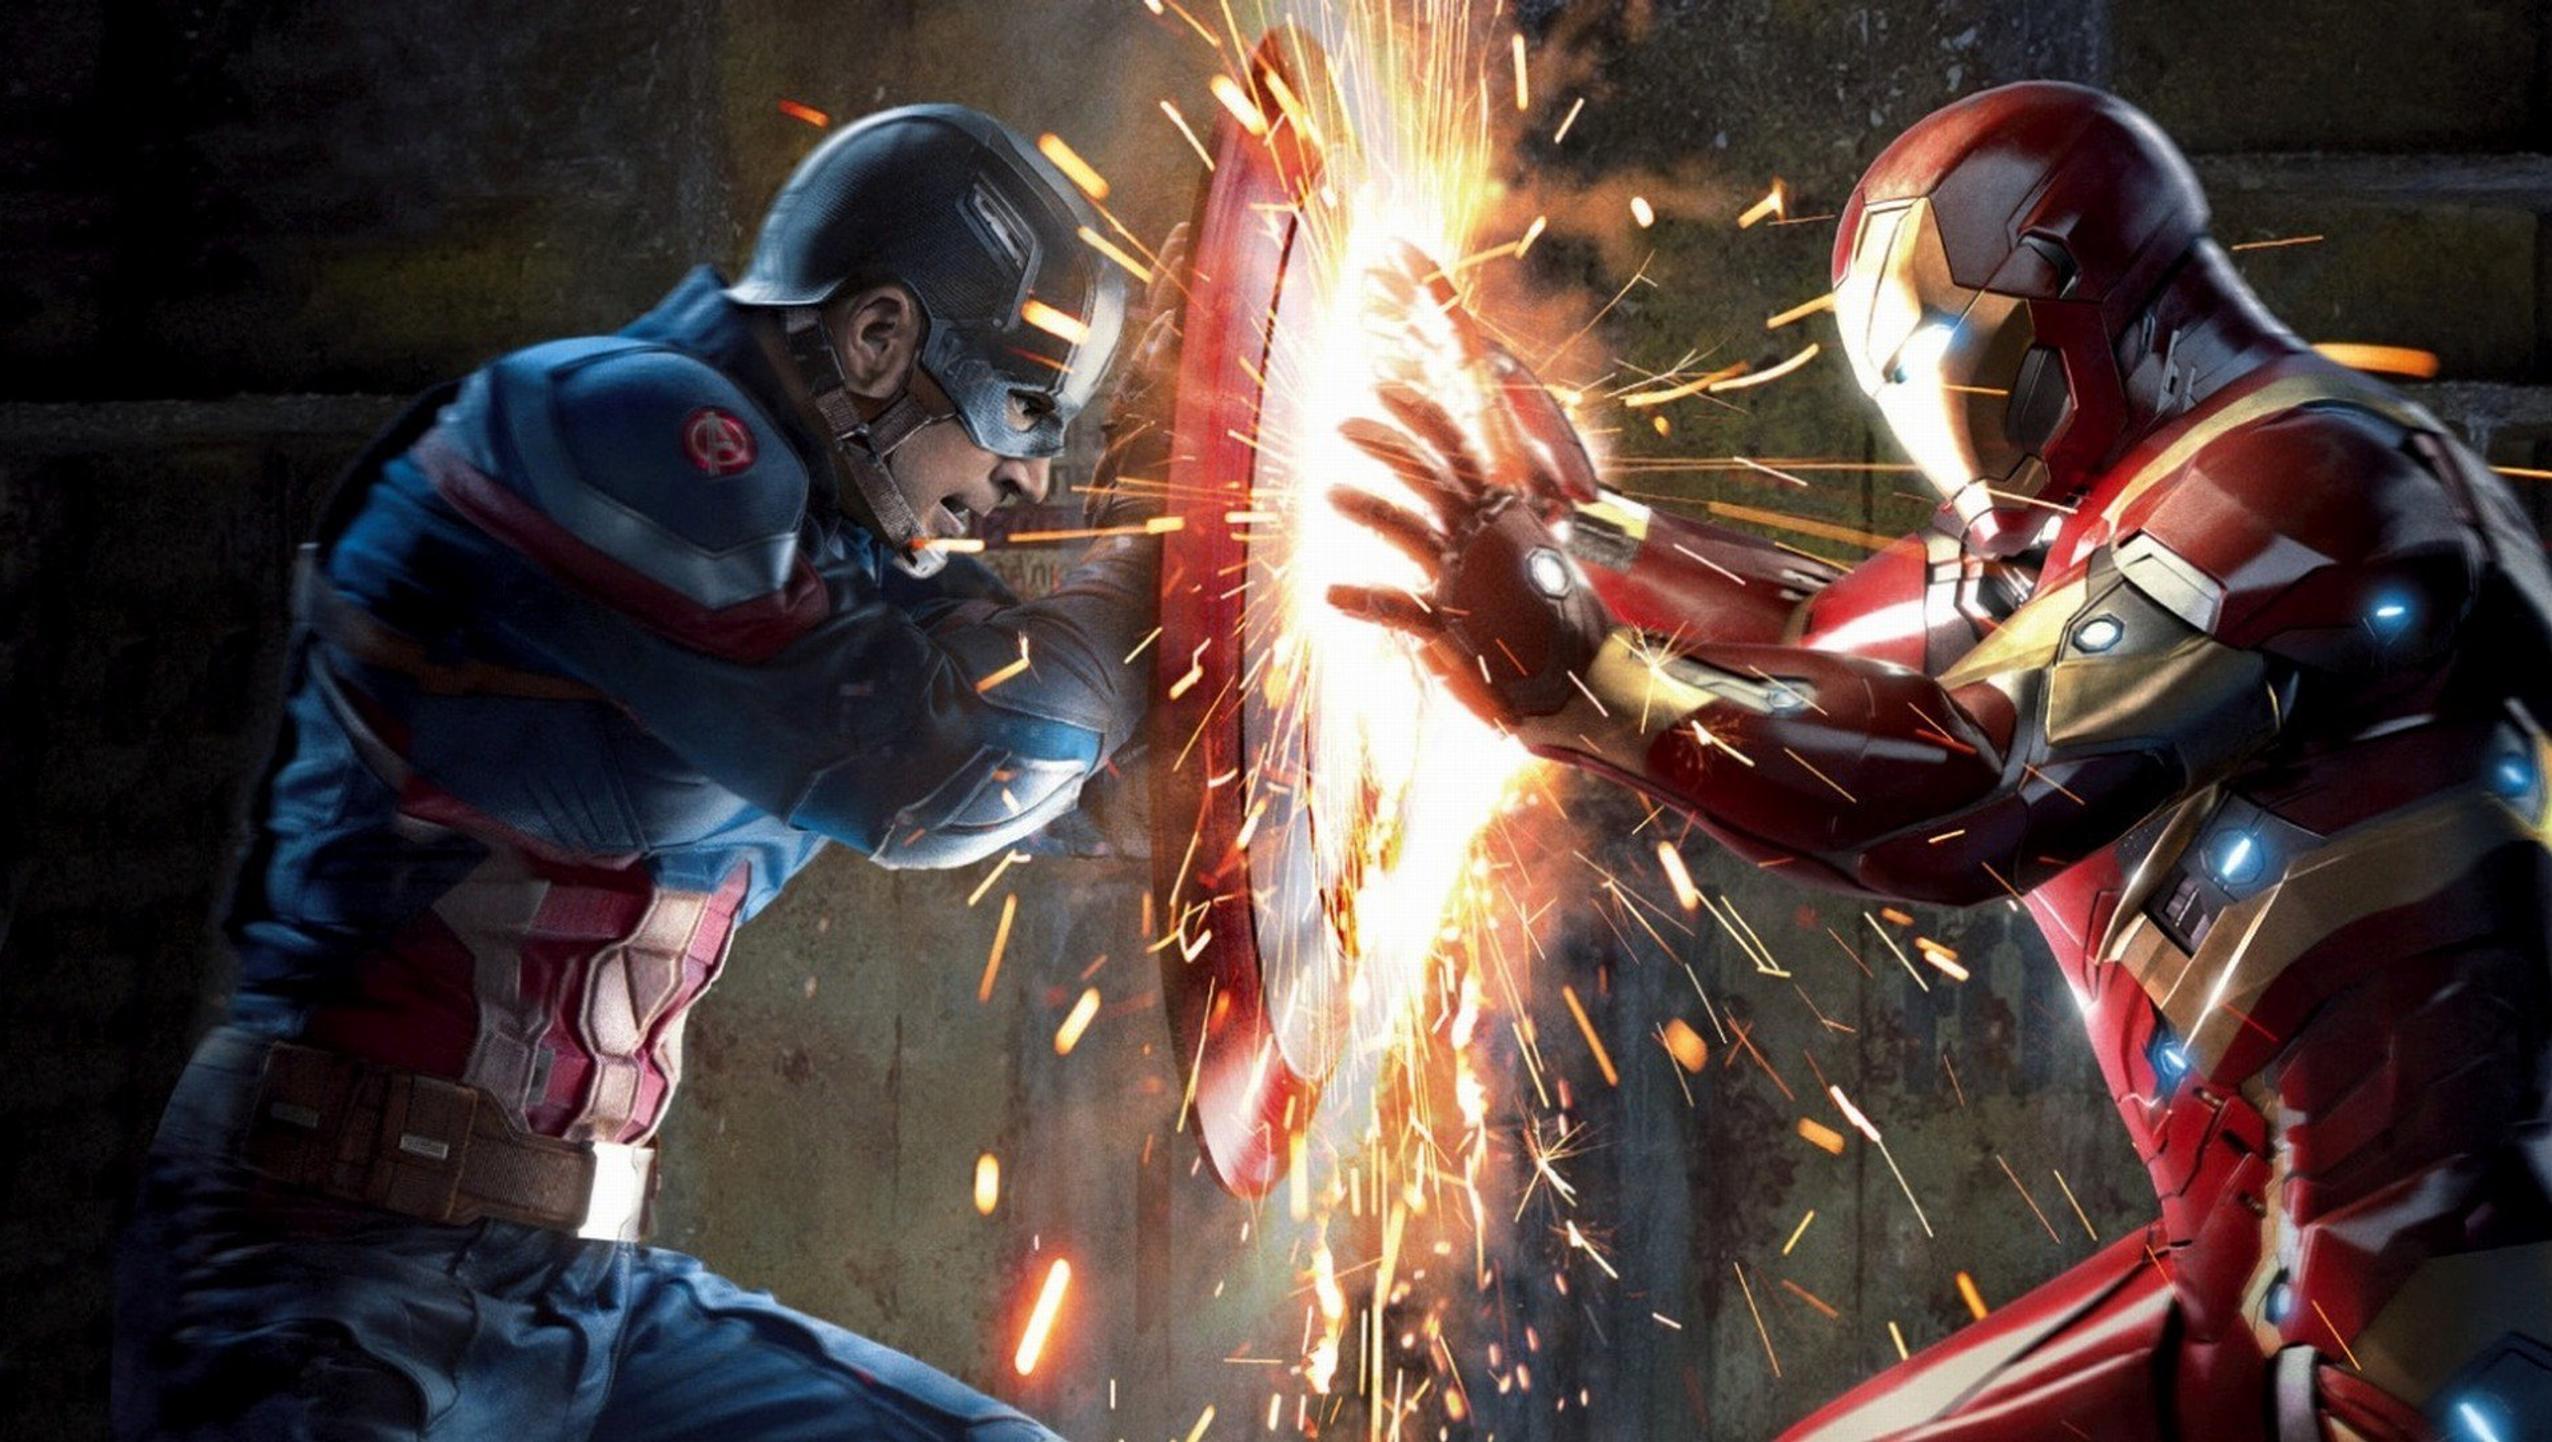 Así sería Capitán América: Civil War si fuera con calificación R